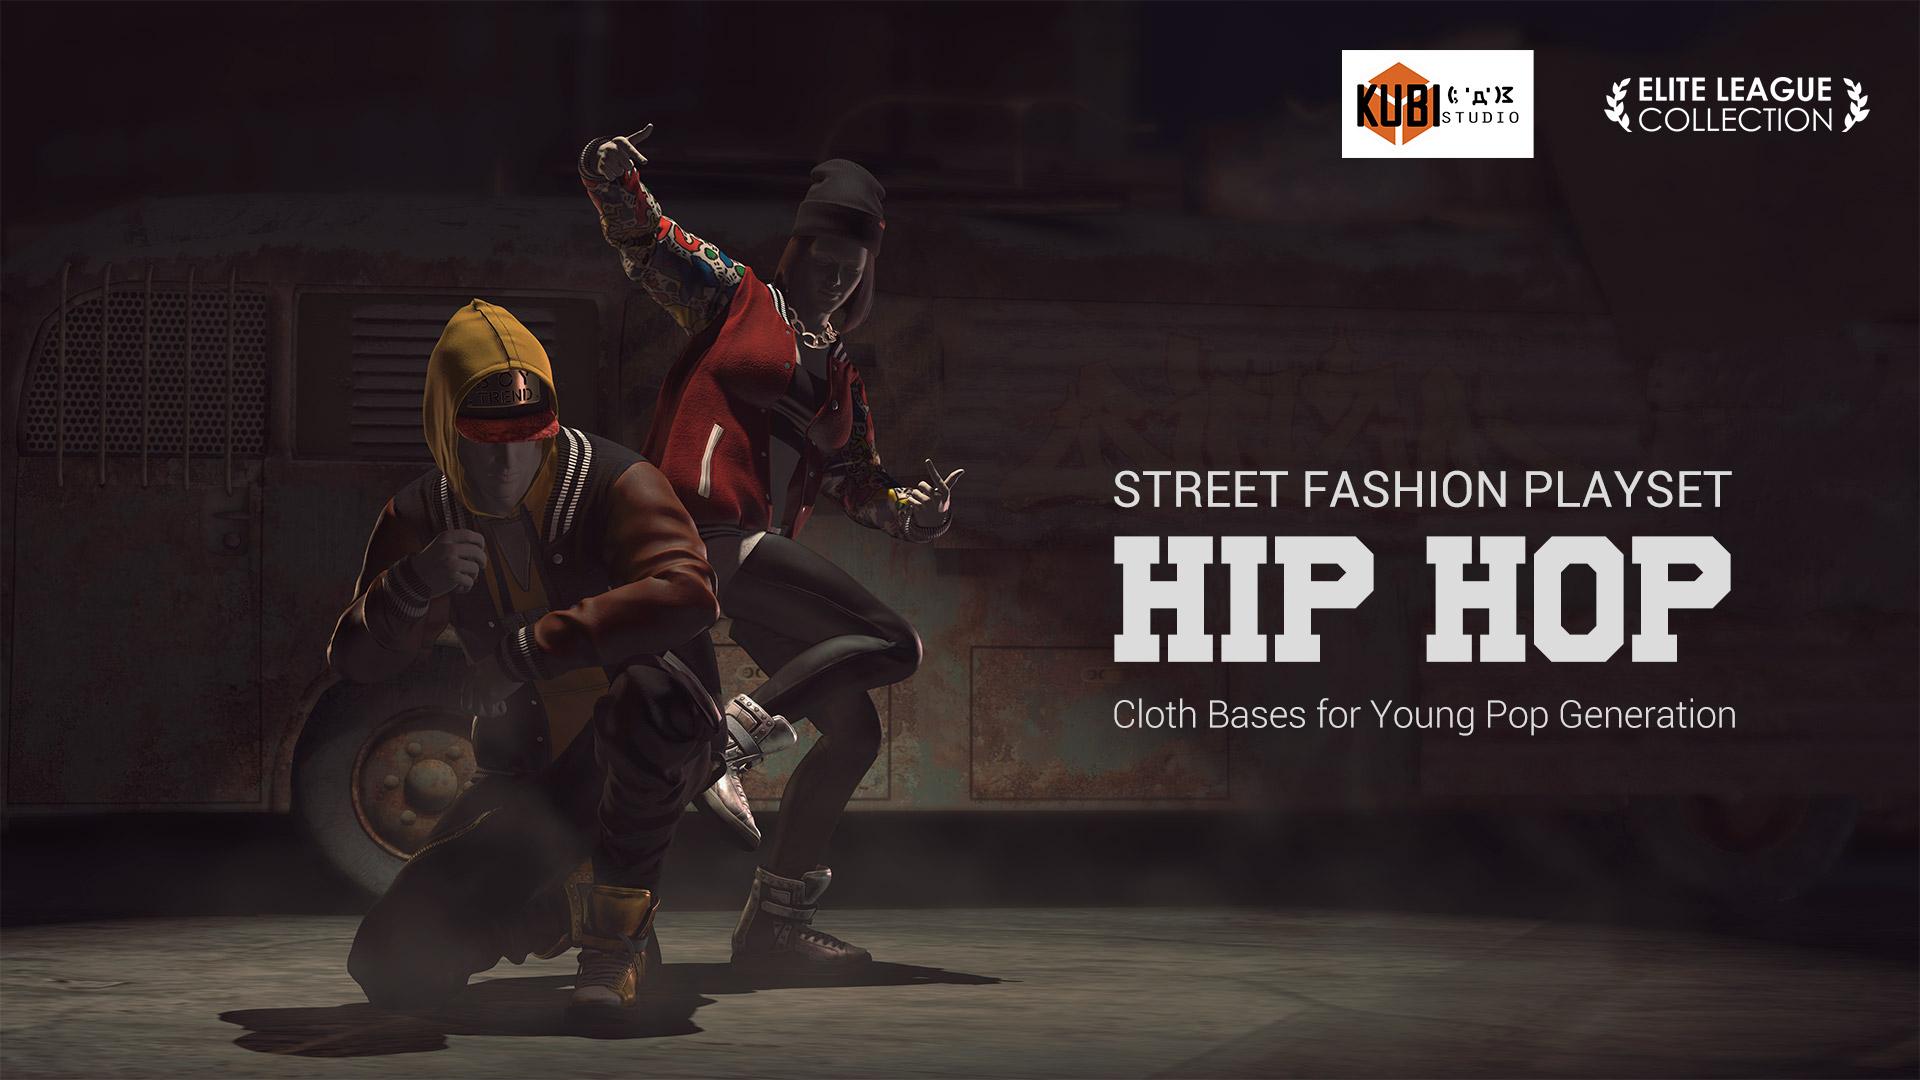 PBR] Street Fashion Playset - Hip Hop (2018/01)